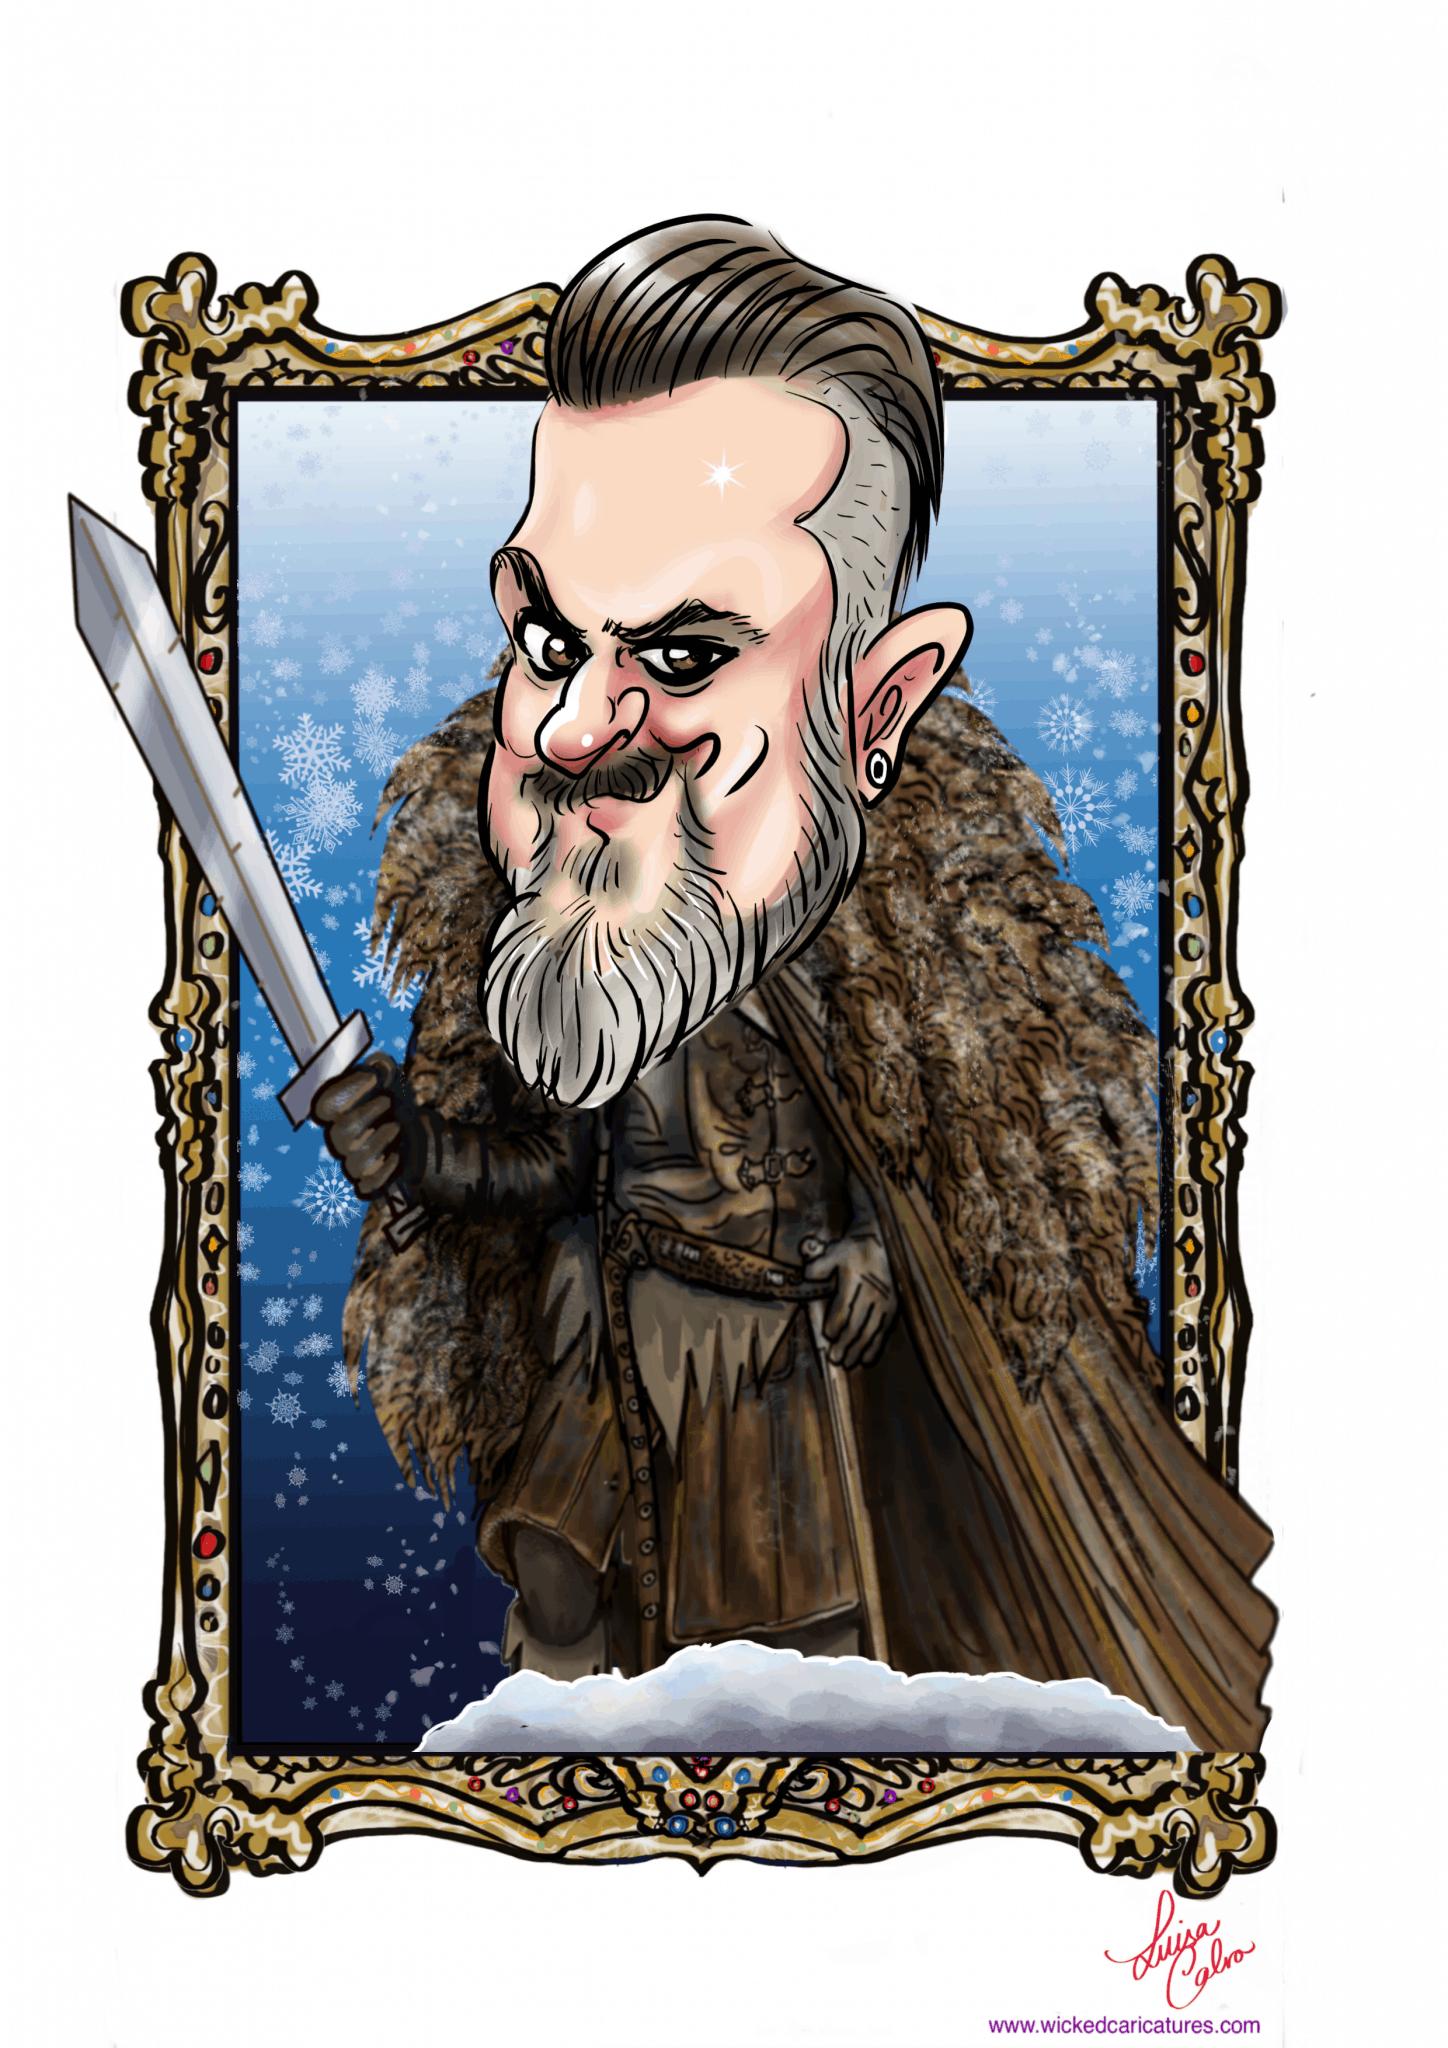 Gameof Thrones themed Digital caricatures by Luisa Calvo for Cisco in Brighton